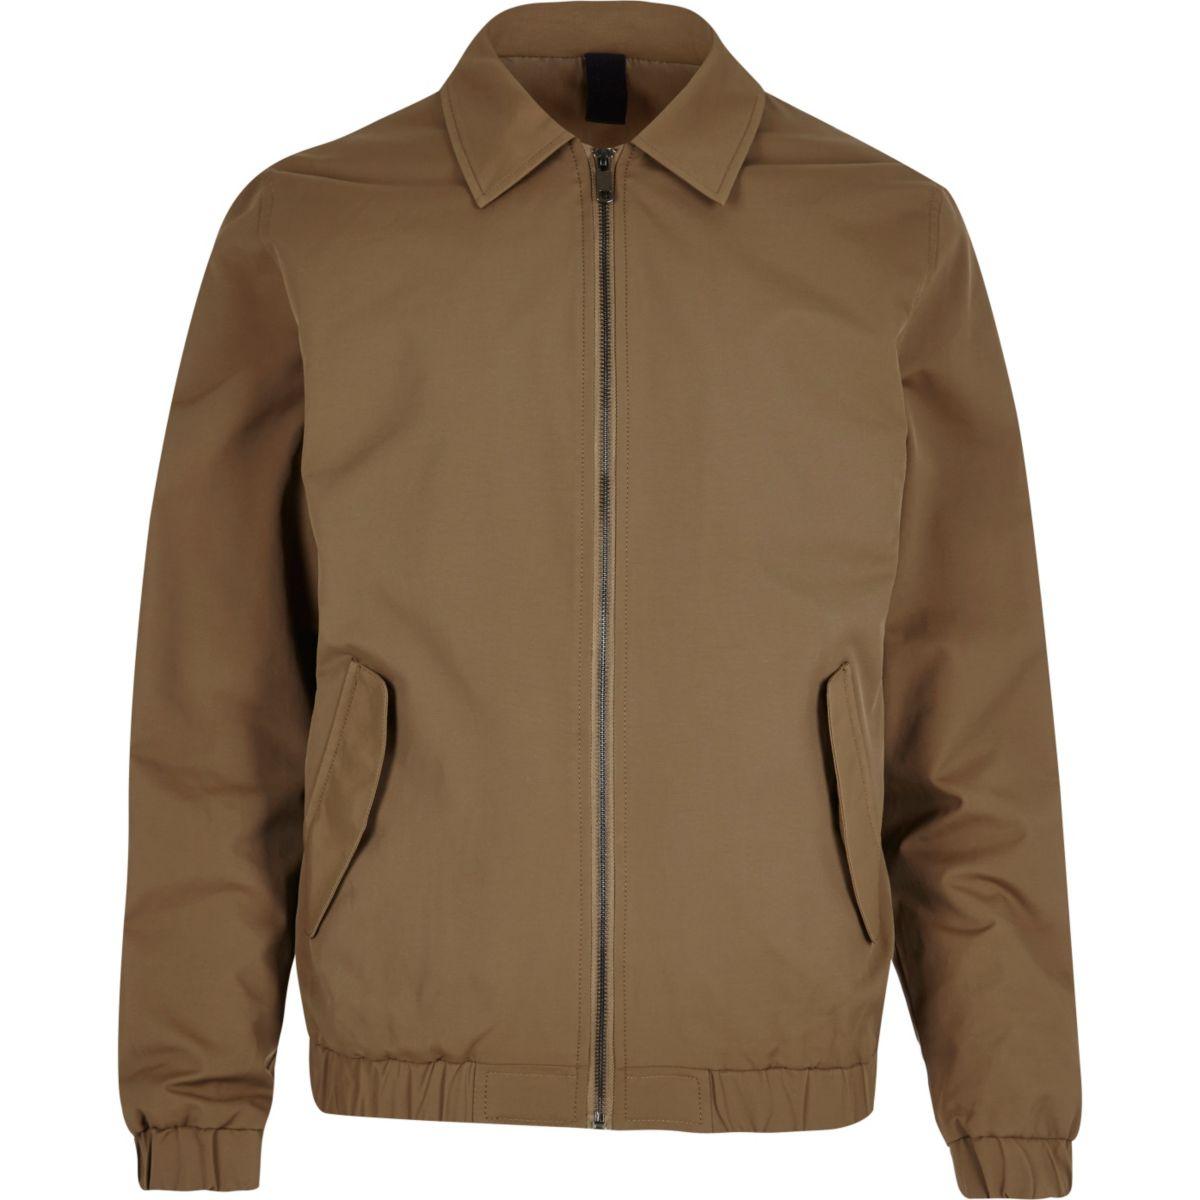 Brown harrington jacket